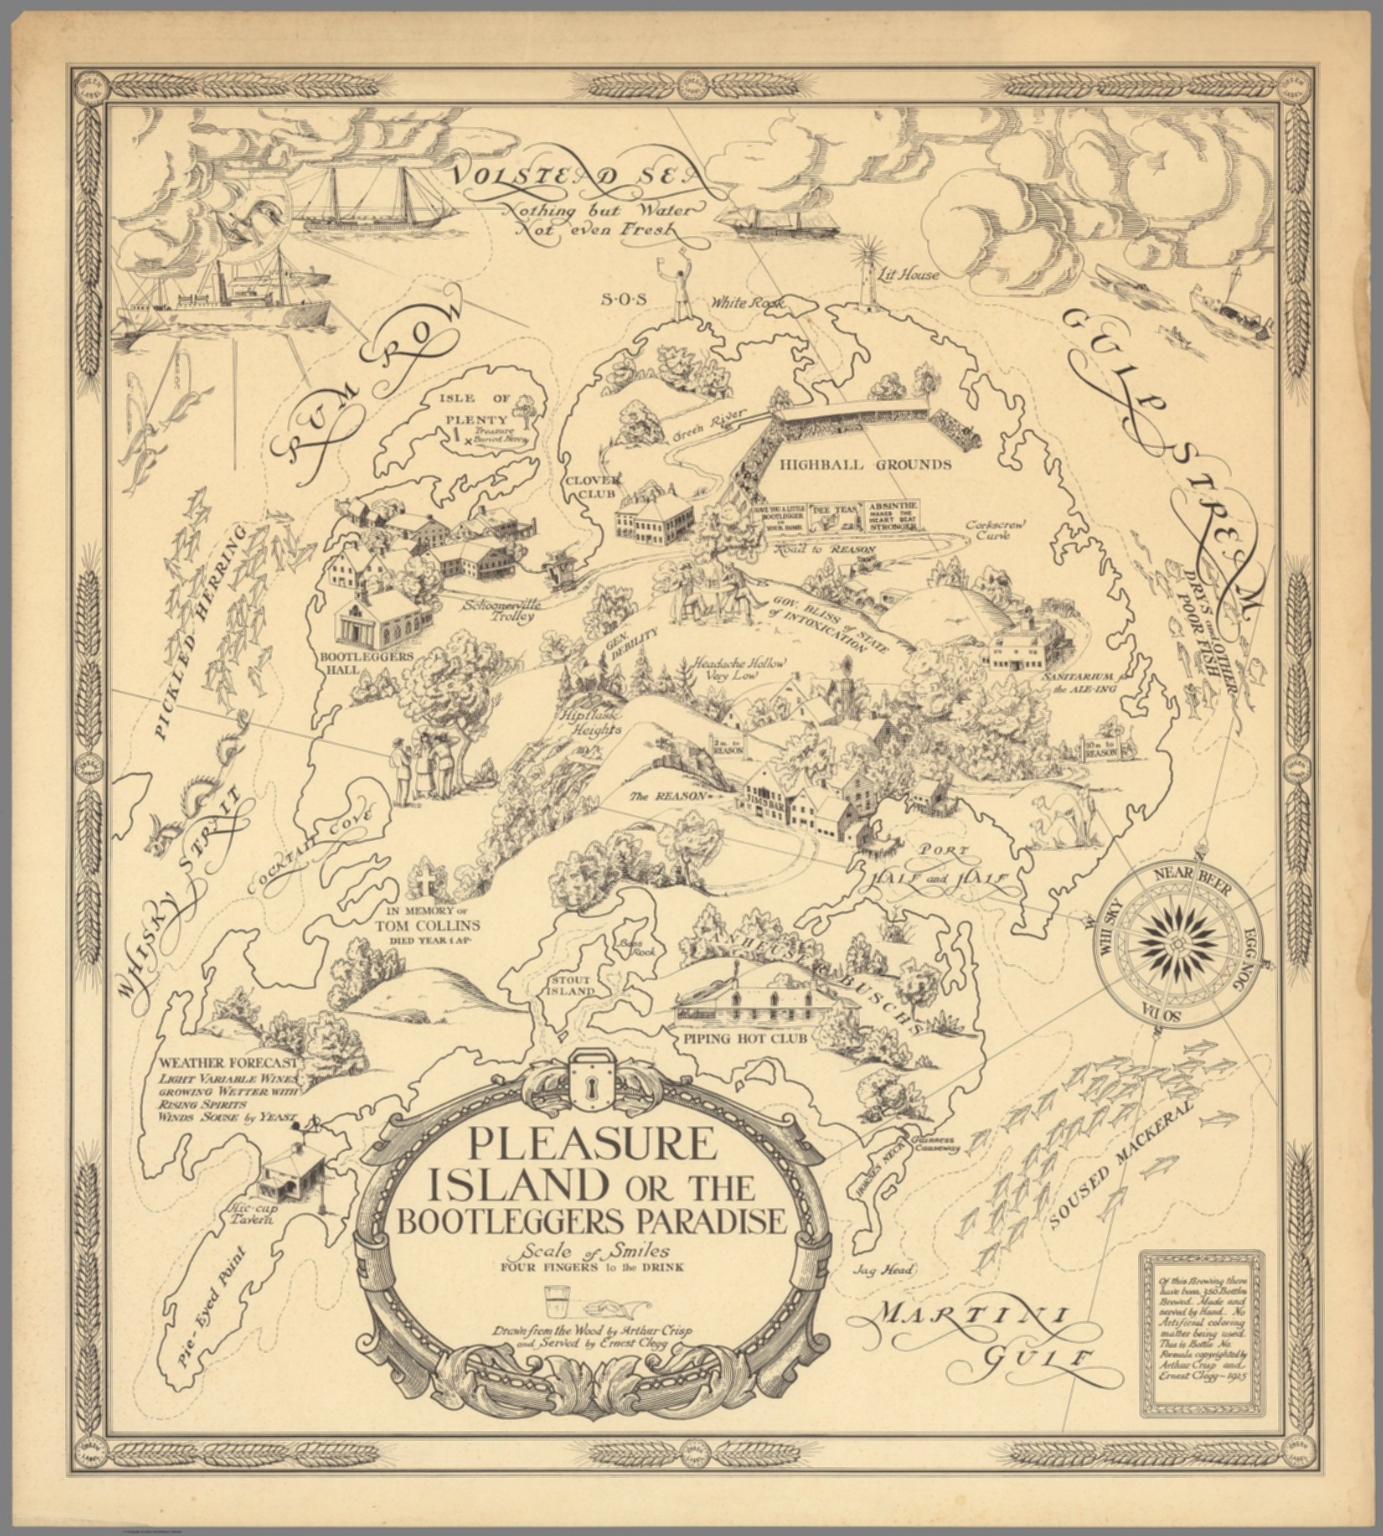 Pleasure Island or the Bootleggers Paradise.